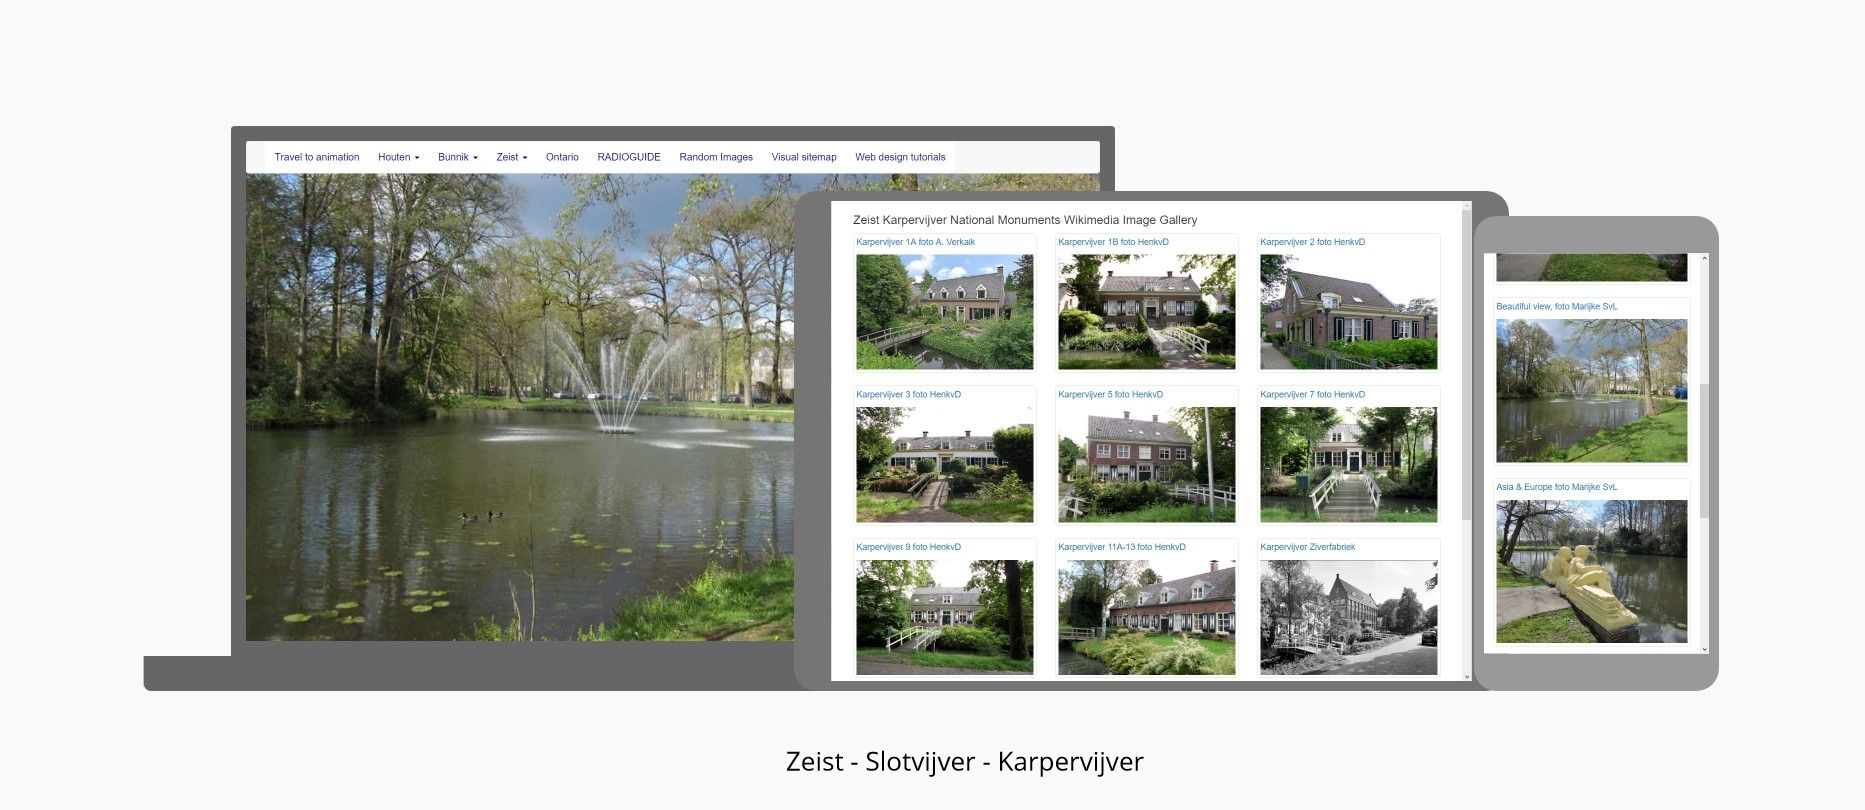 Slotvijver - Karpervijver - Asia and Europe